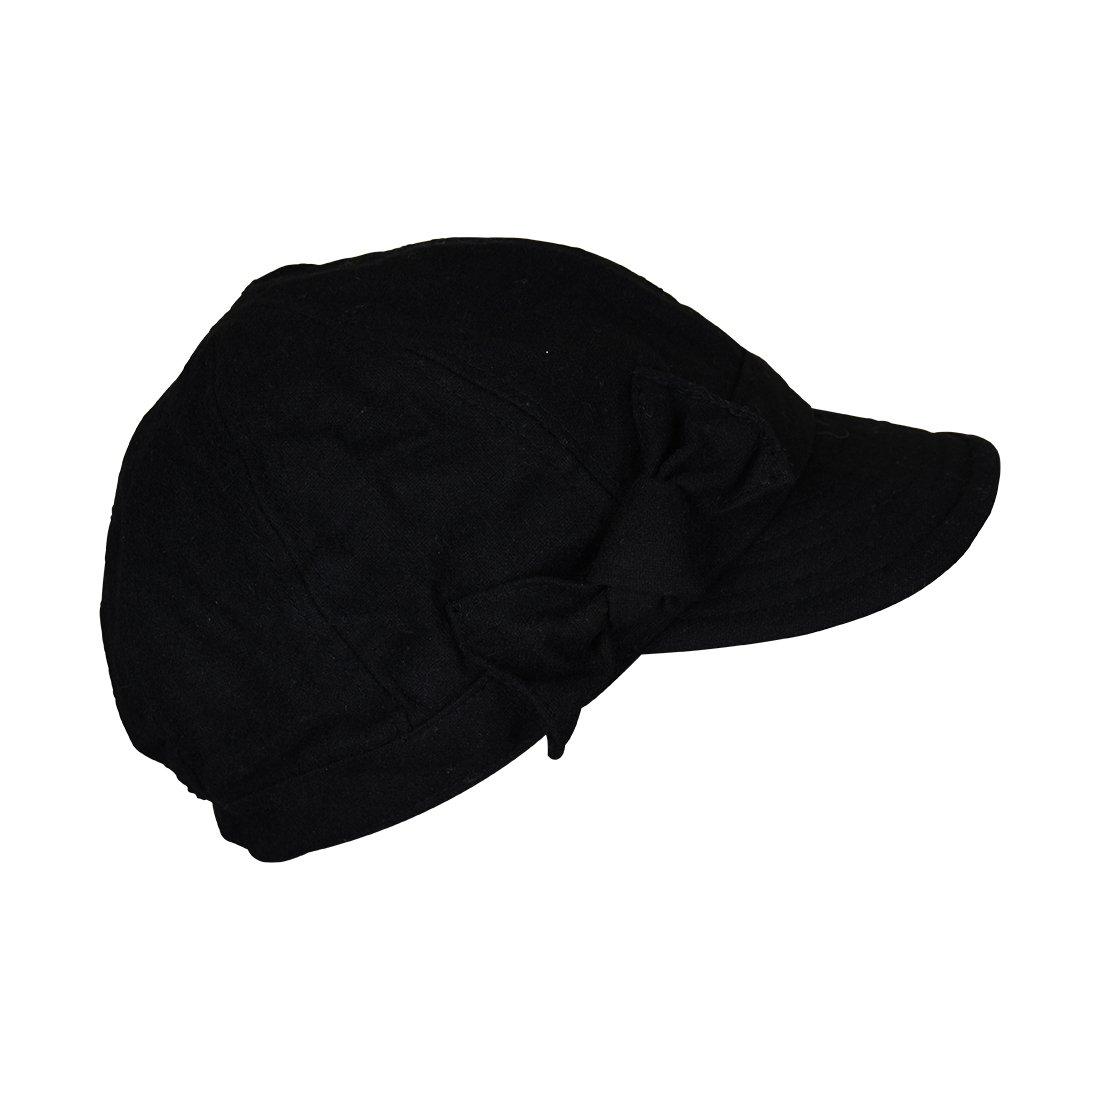 Landana Headscarves Ladies Winter Cap with Bow - Black